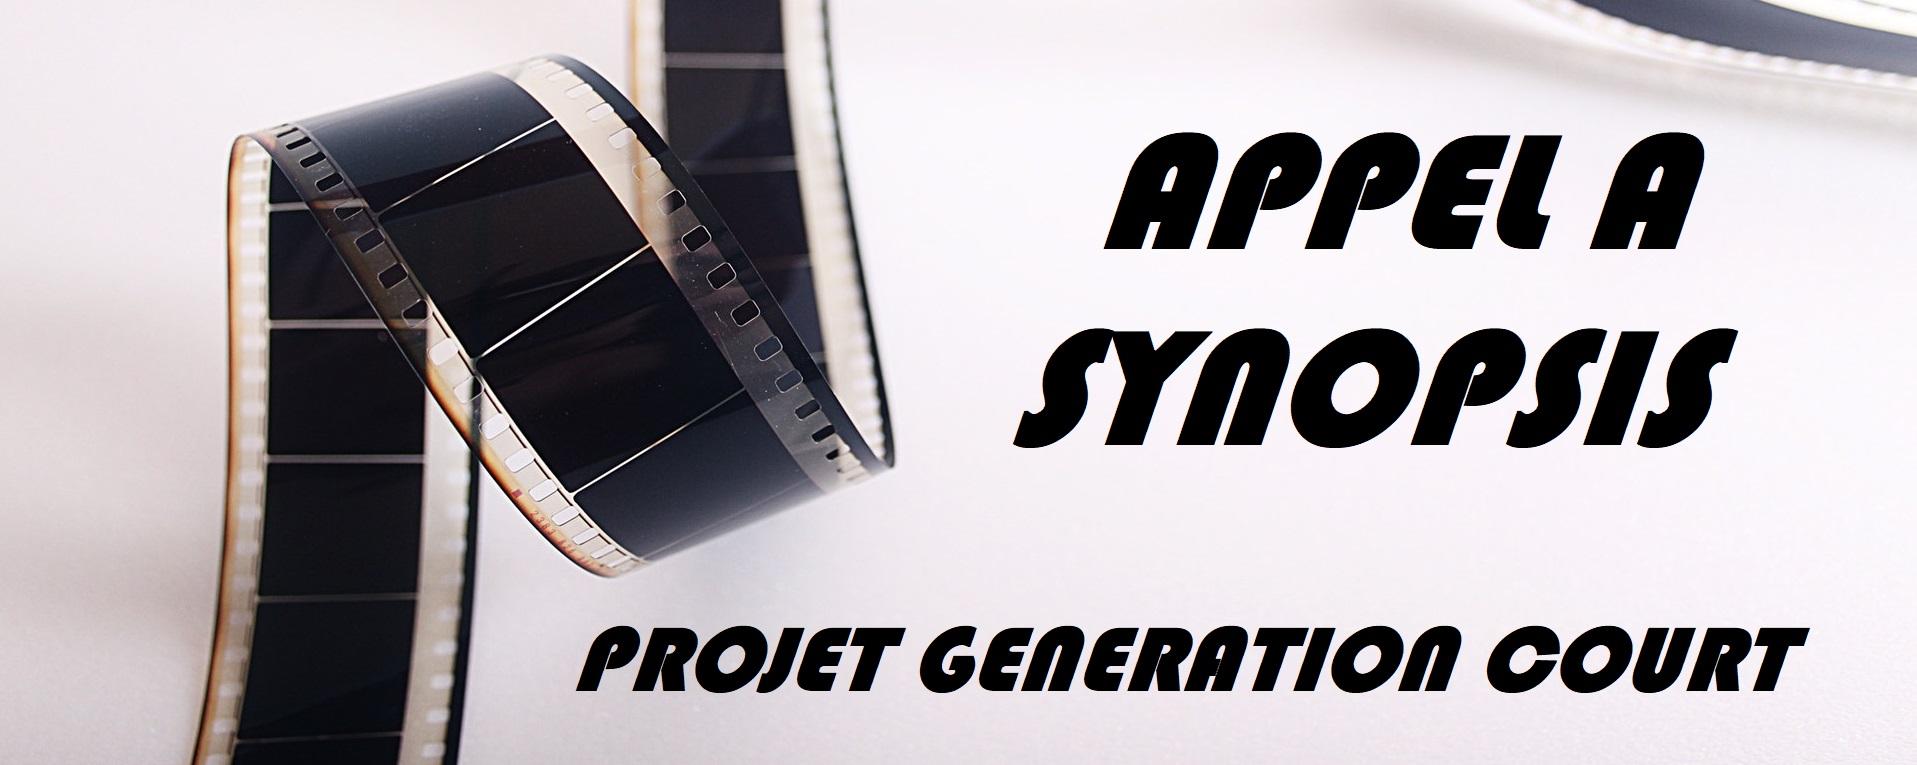 cinema-cinematography-curve-65128 (1)